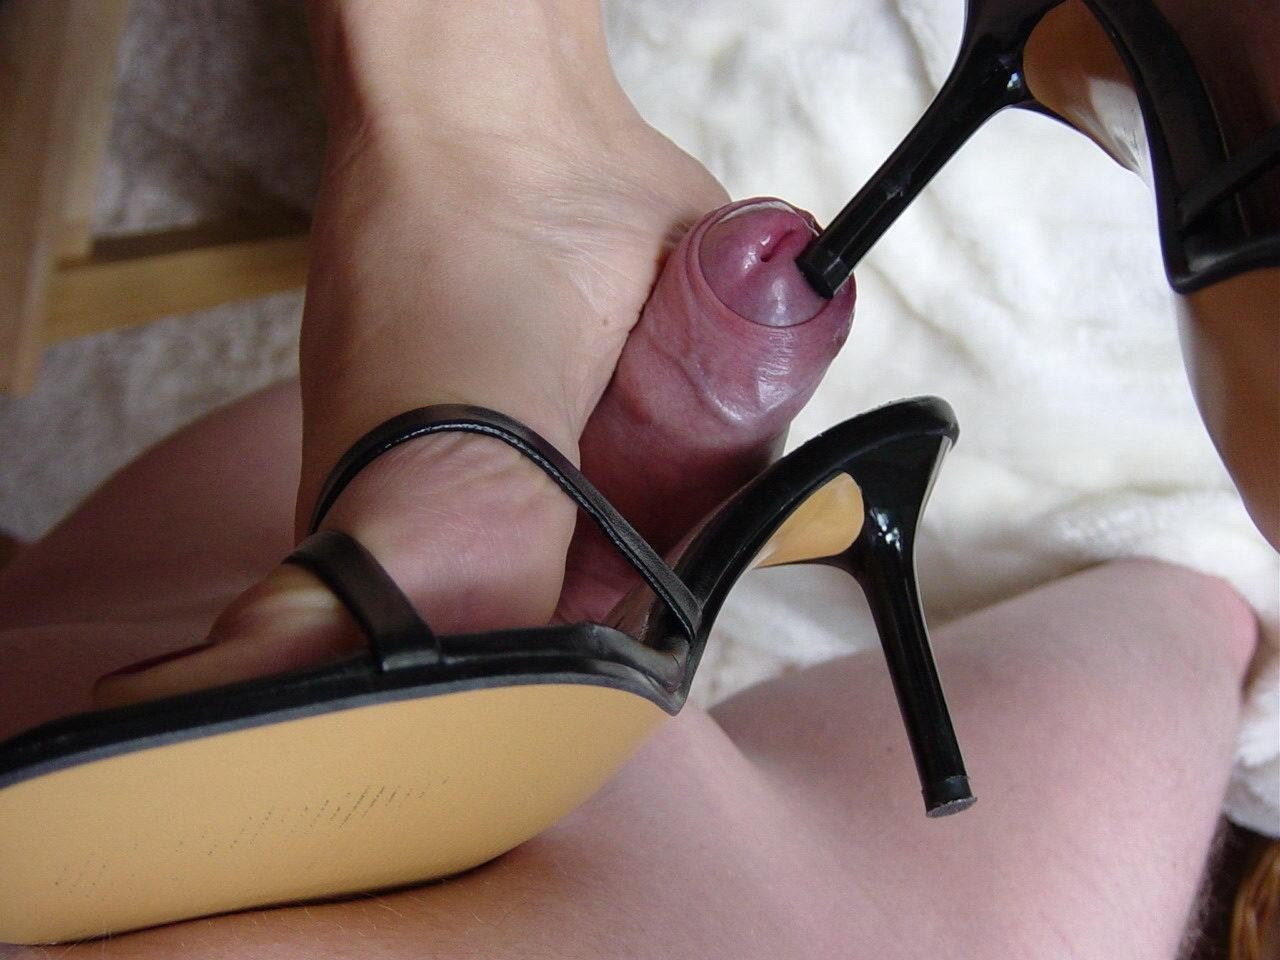 Post Orgasm Torture Femdom